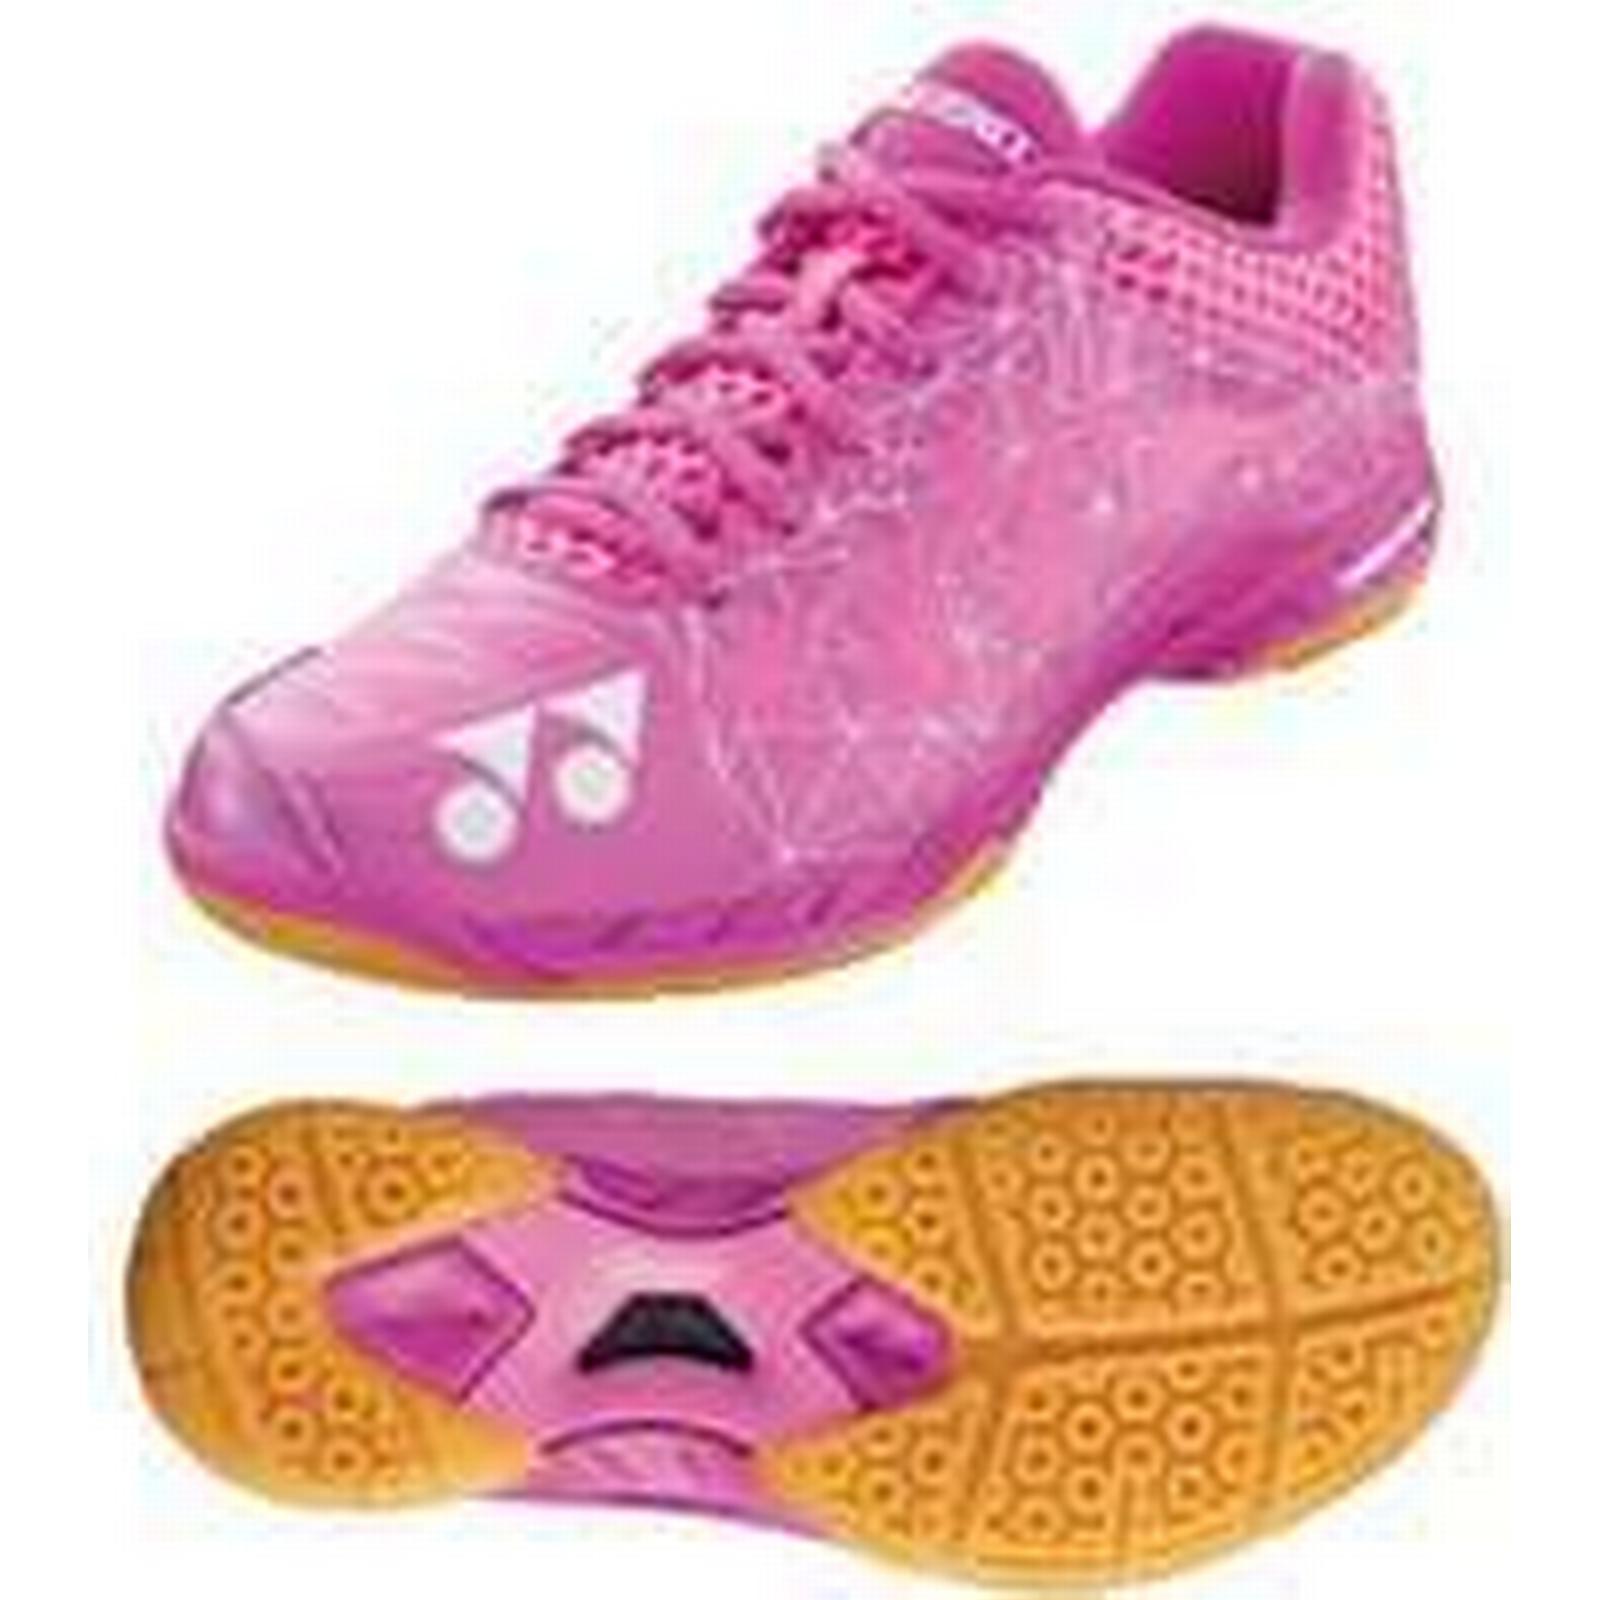 Yonex Power Badminton Cushion Aerus 2 Ladies Badminton Power Shoes - Pink, 4.5 UK 3ba49a